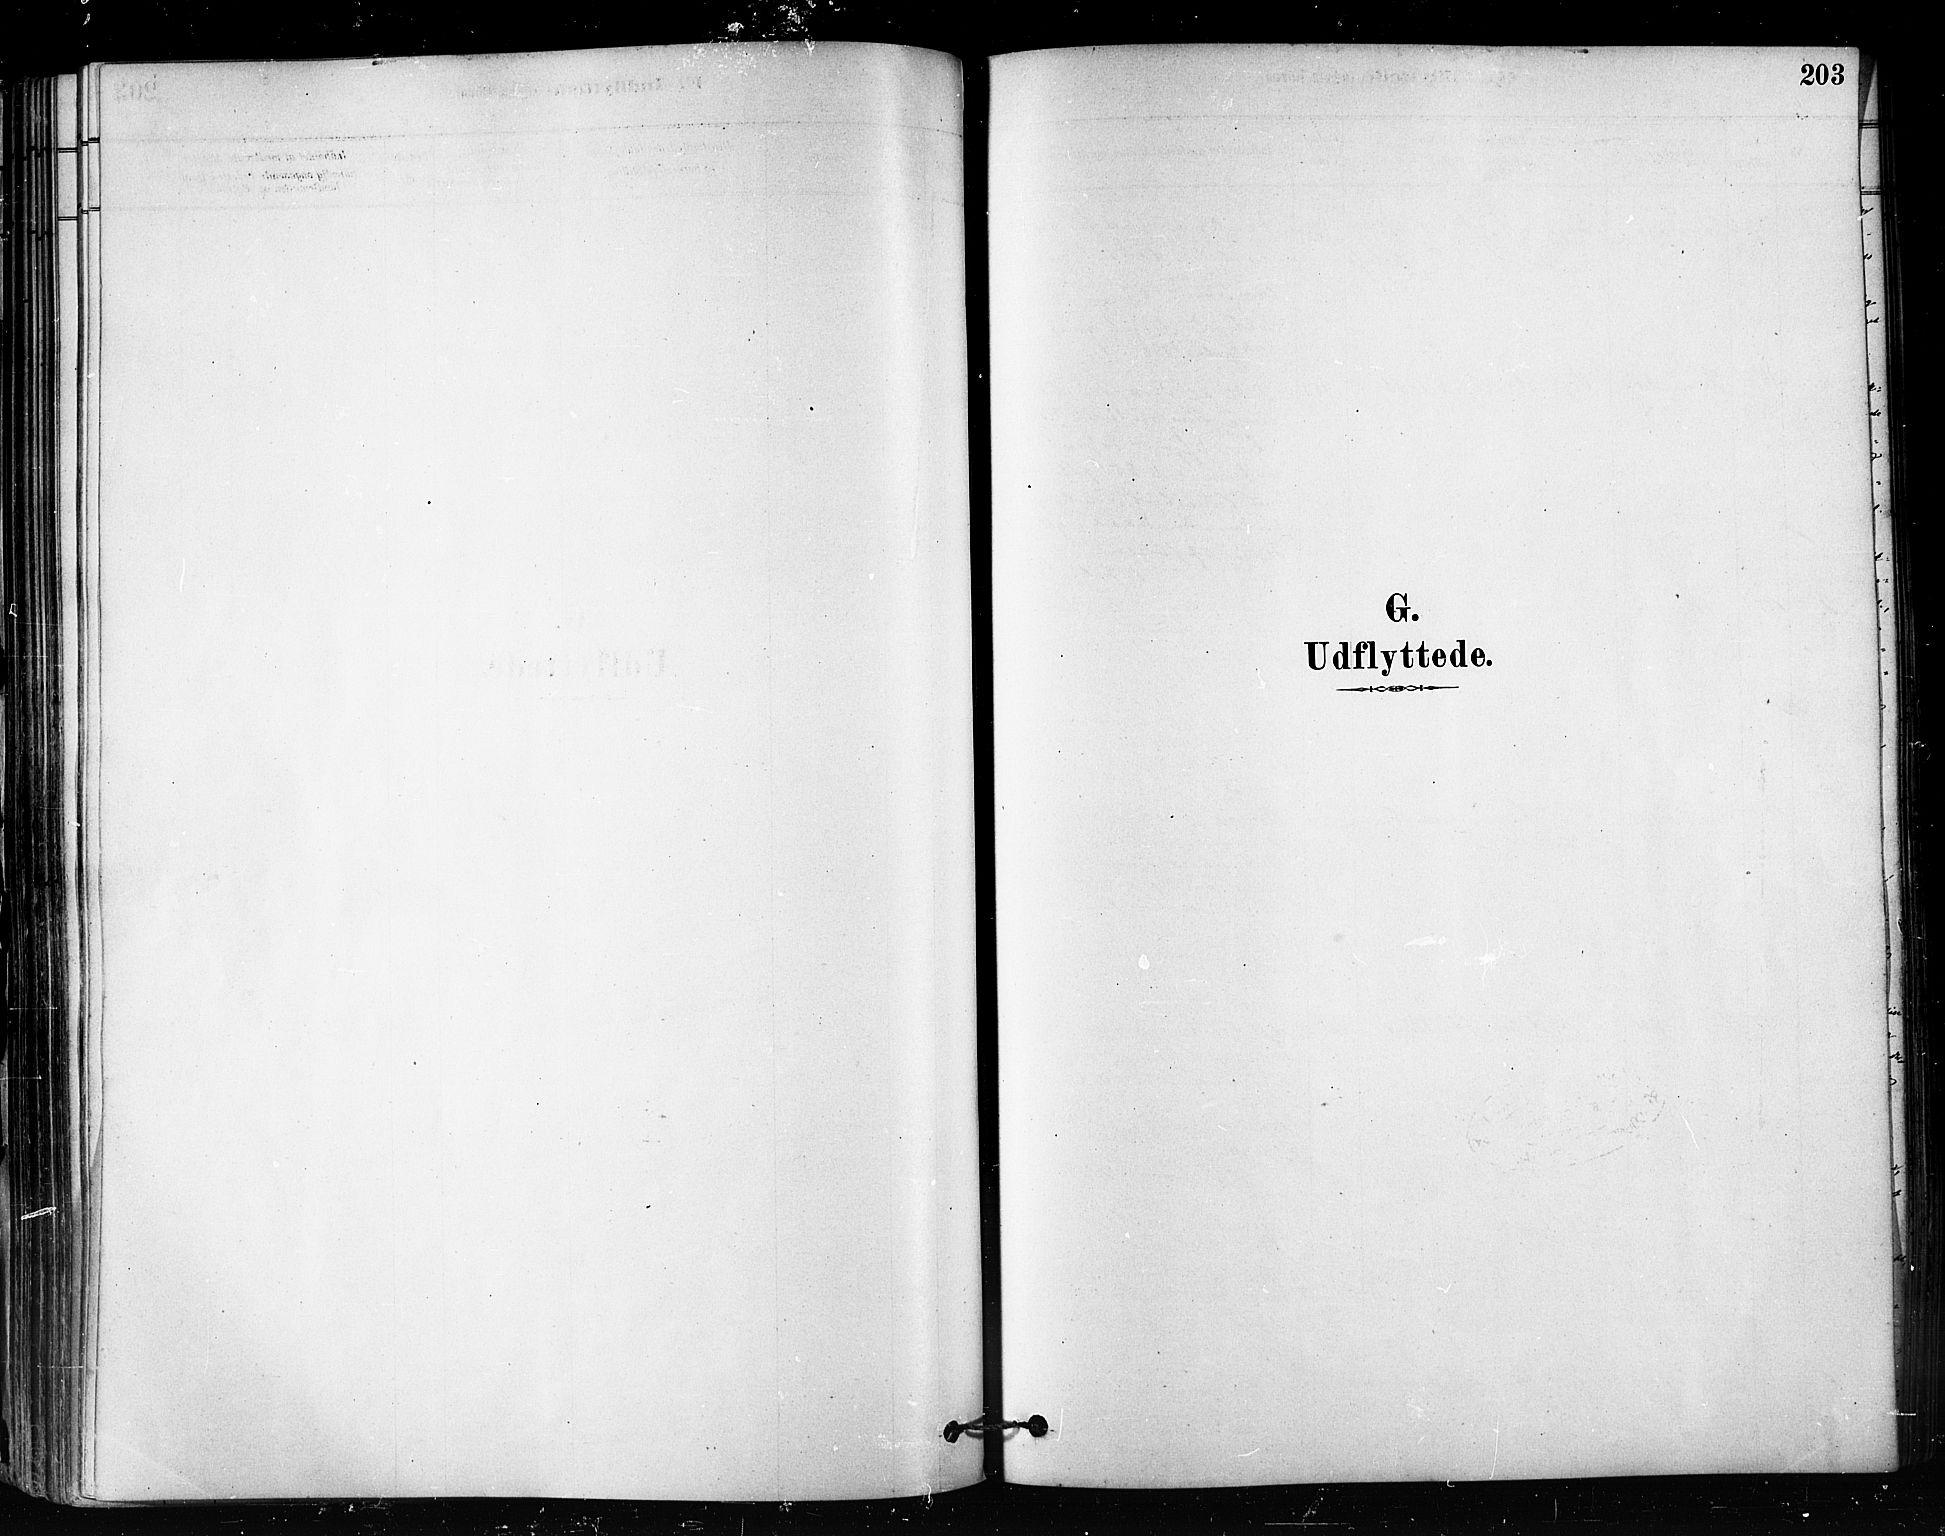 SATØ, Talvik sokneprestkontor, H/Ha/L0012kirke: Ministerialbok nr. 12, 1878-1886, s. 203